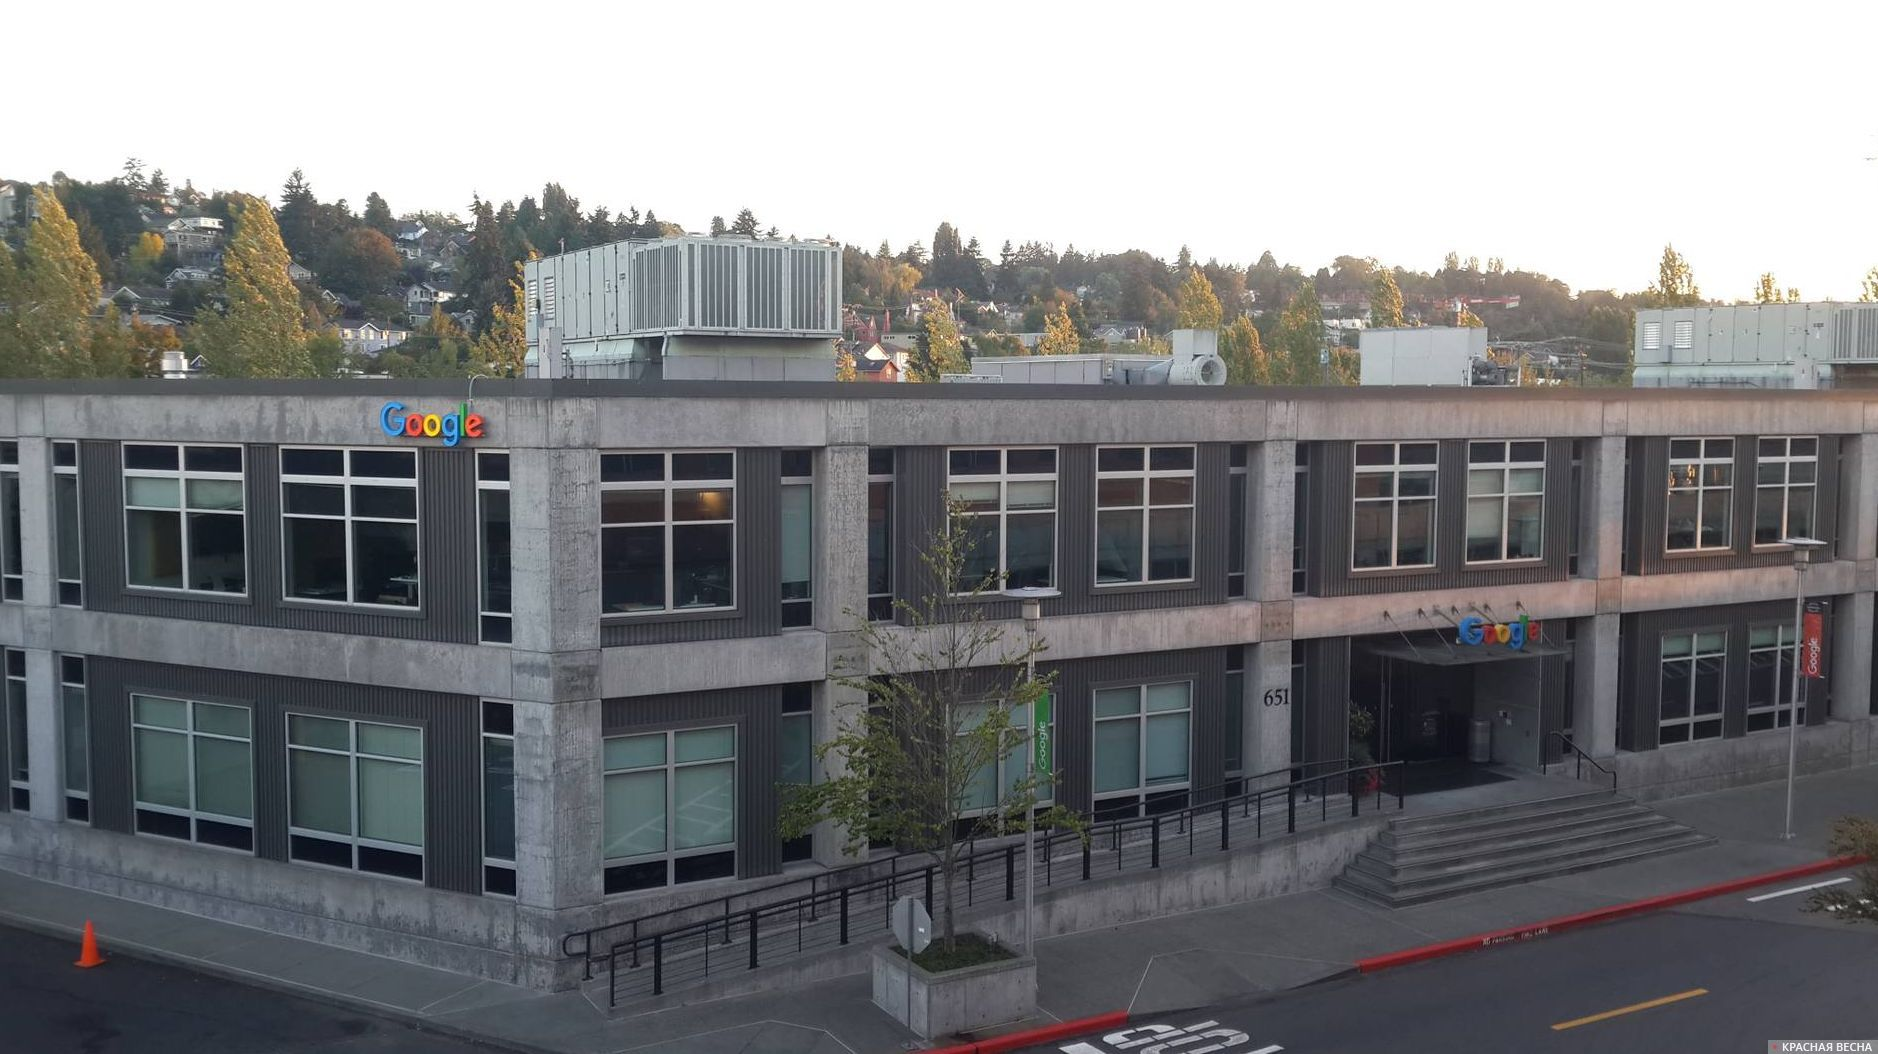 Офис Гугл. Сиэтл